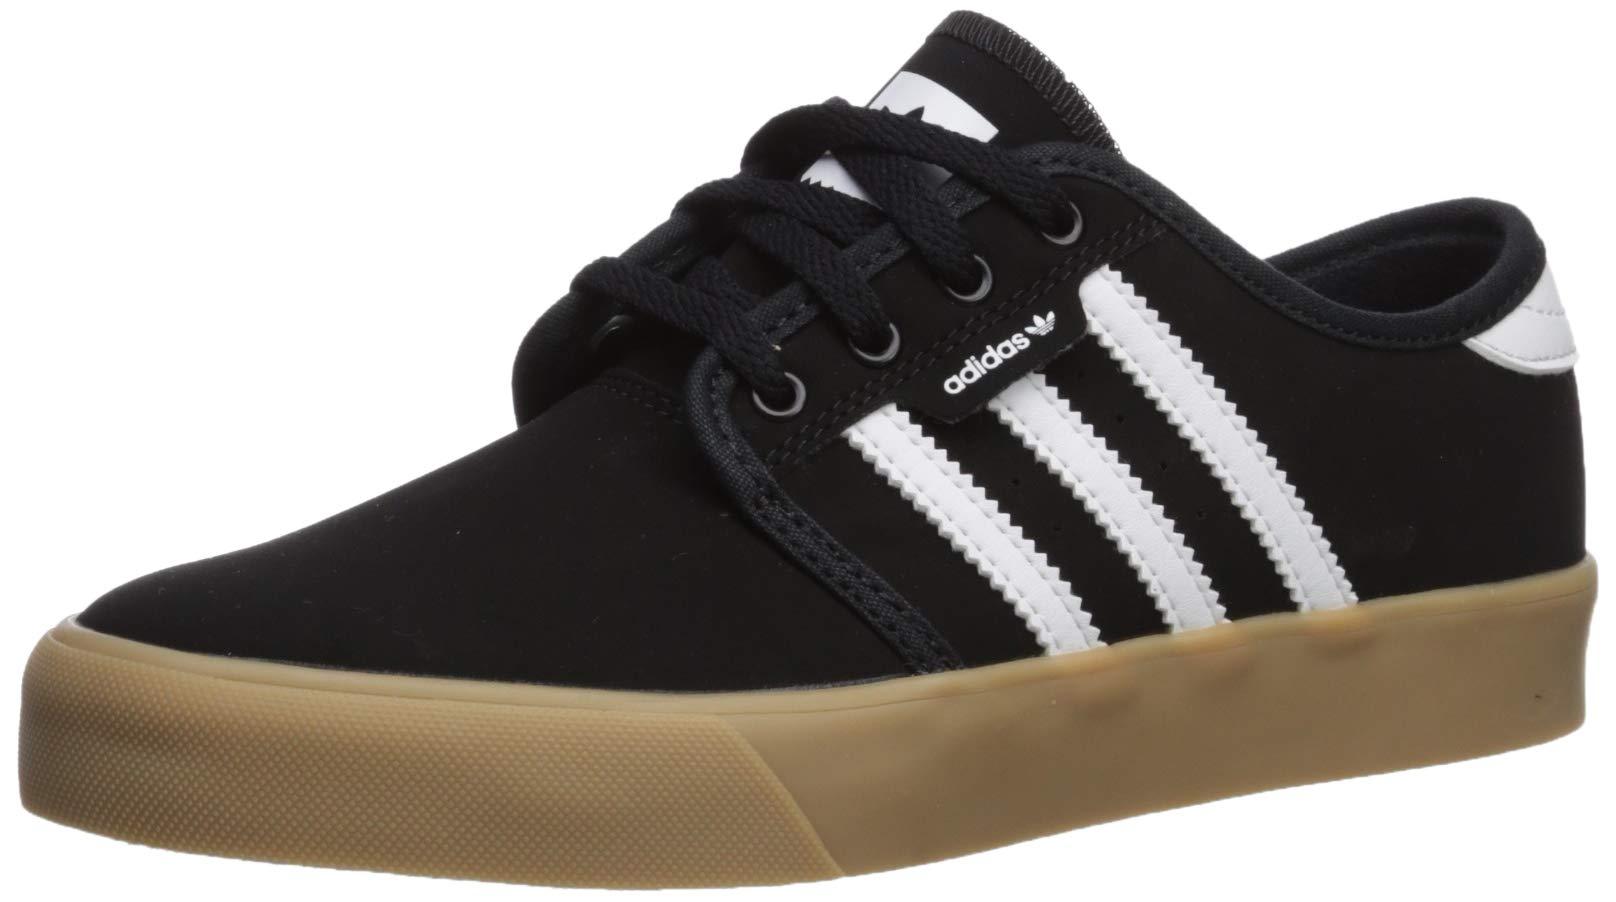 adidas Originals Unisex Seeley Sneaker, Black/White/Gum, 7 M US Big Kid